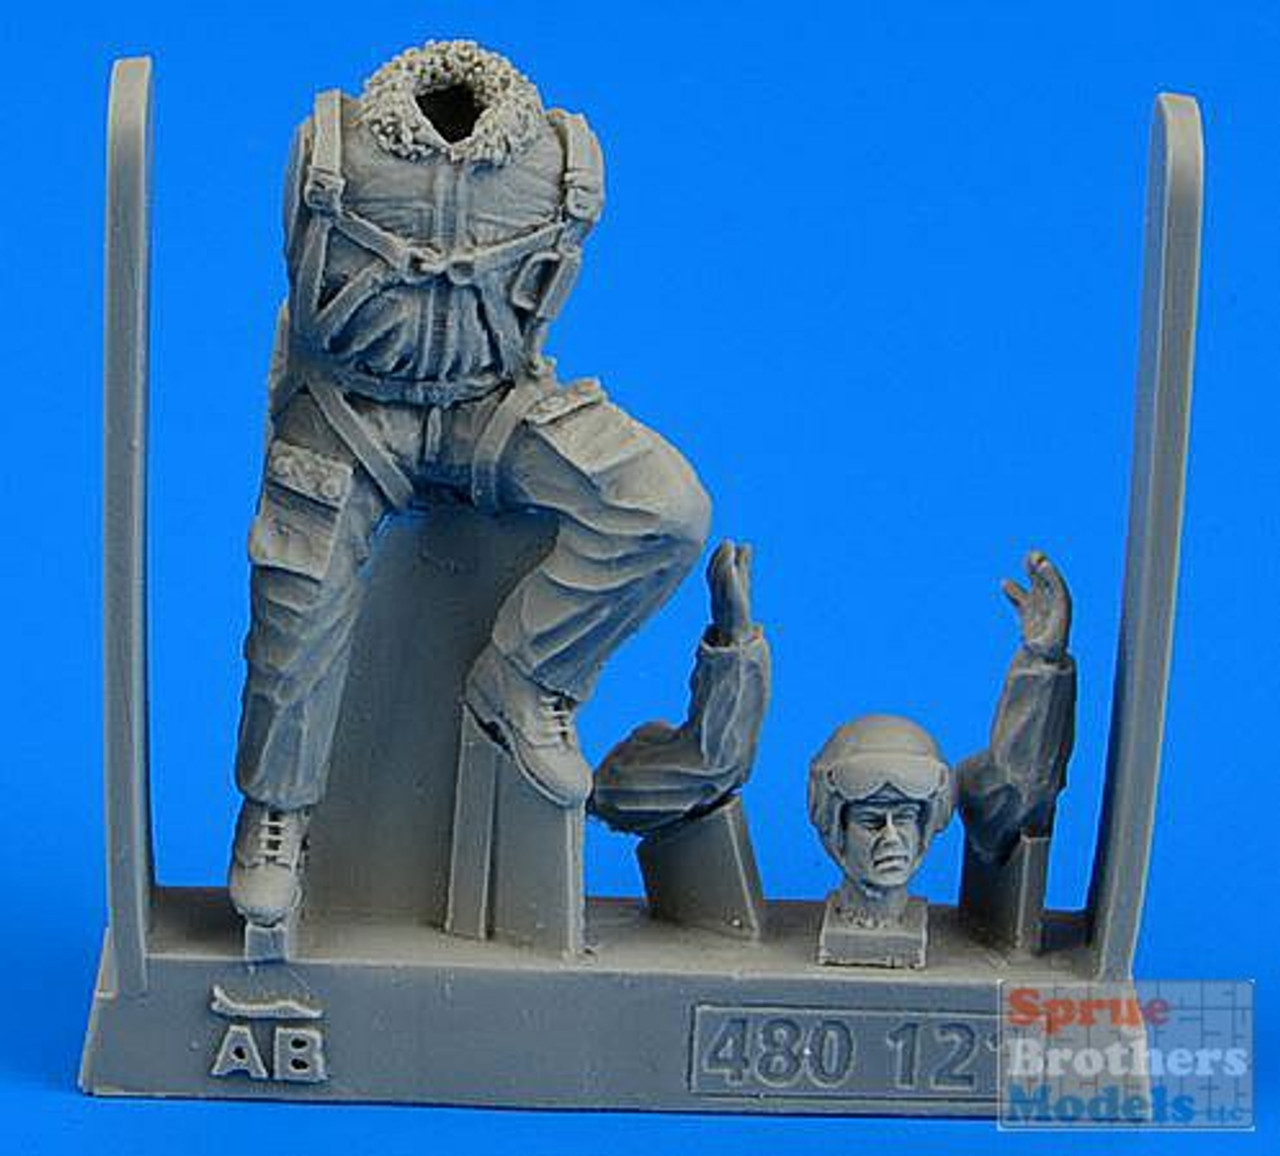 ARSAB480121 1:48 AeroBonus Soviet Pilot - The Cold War Period